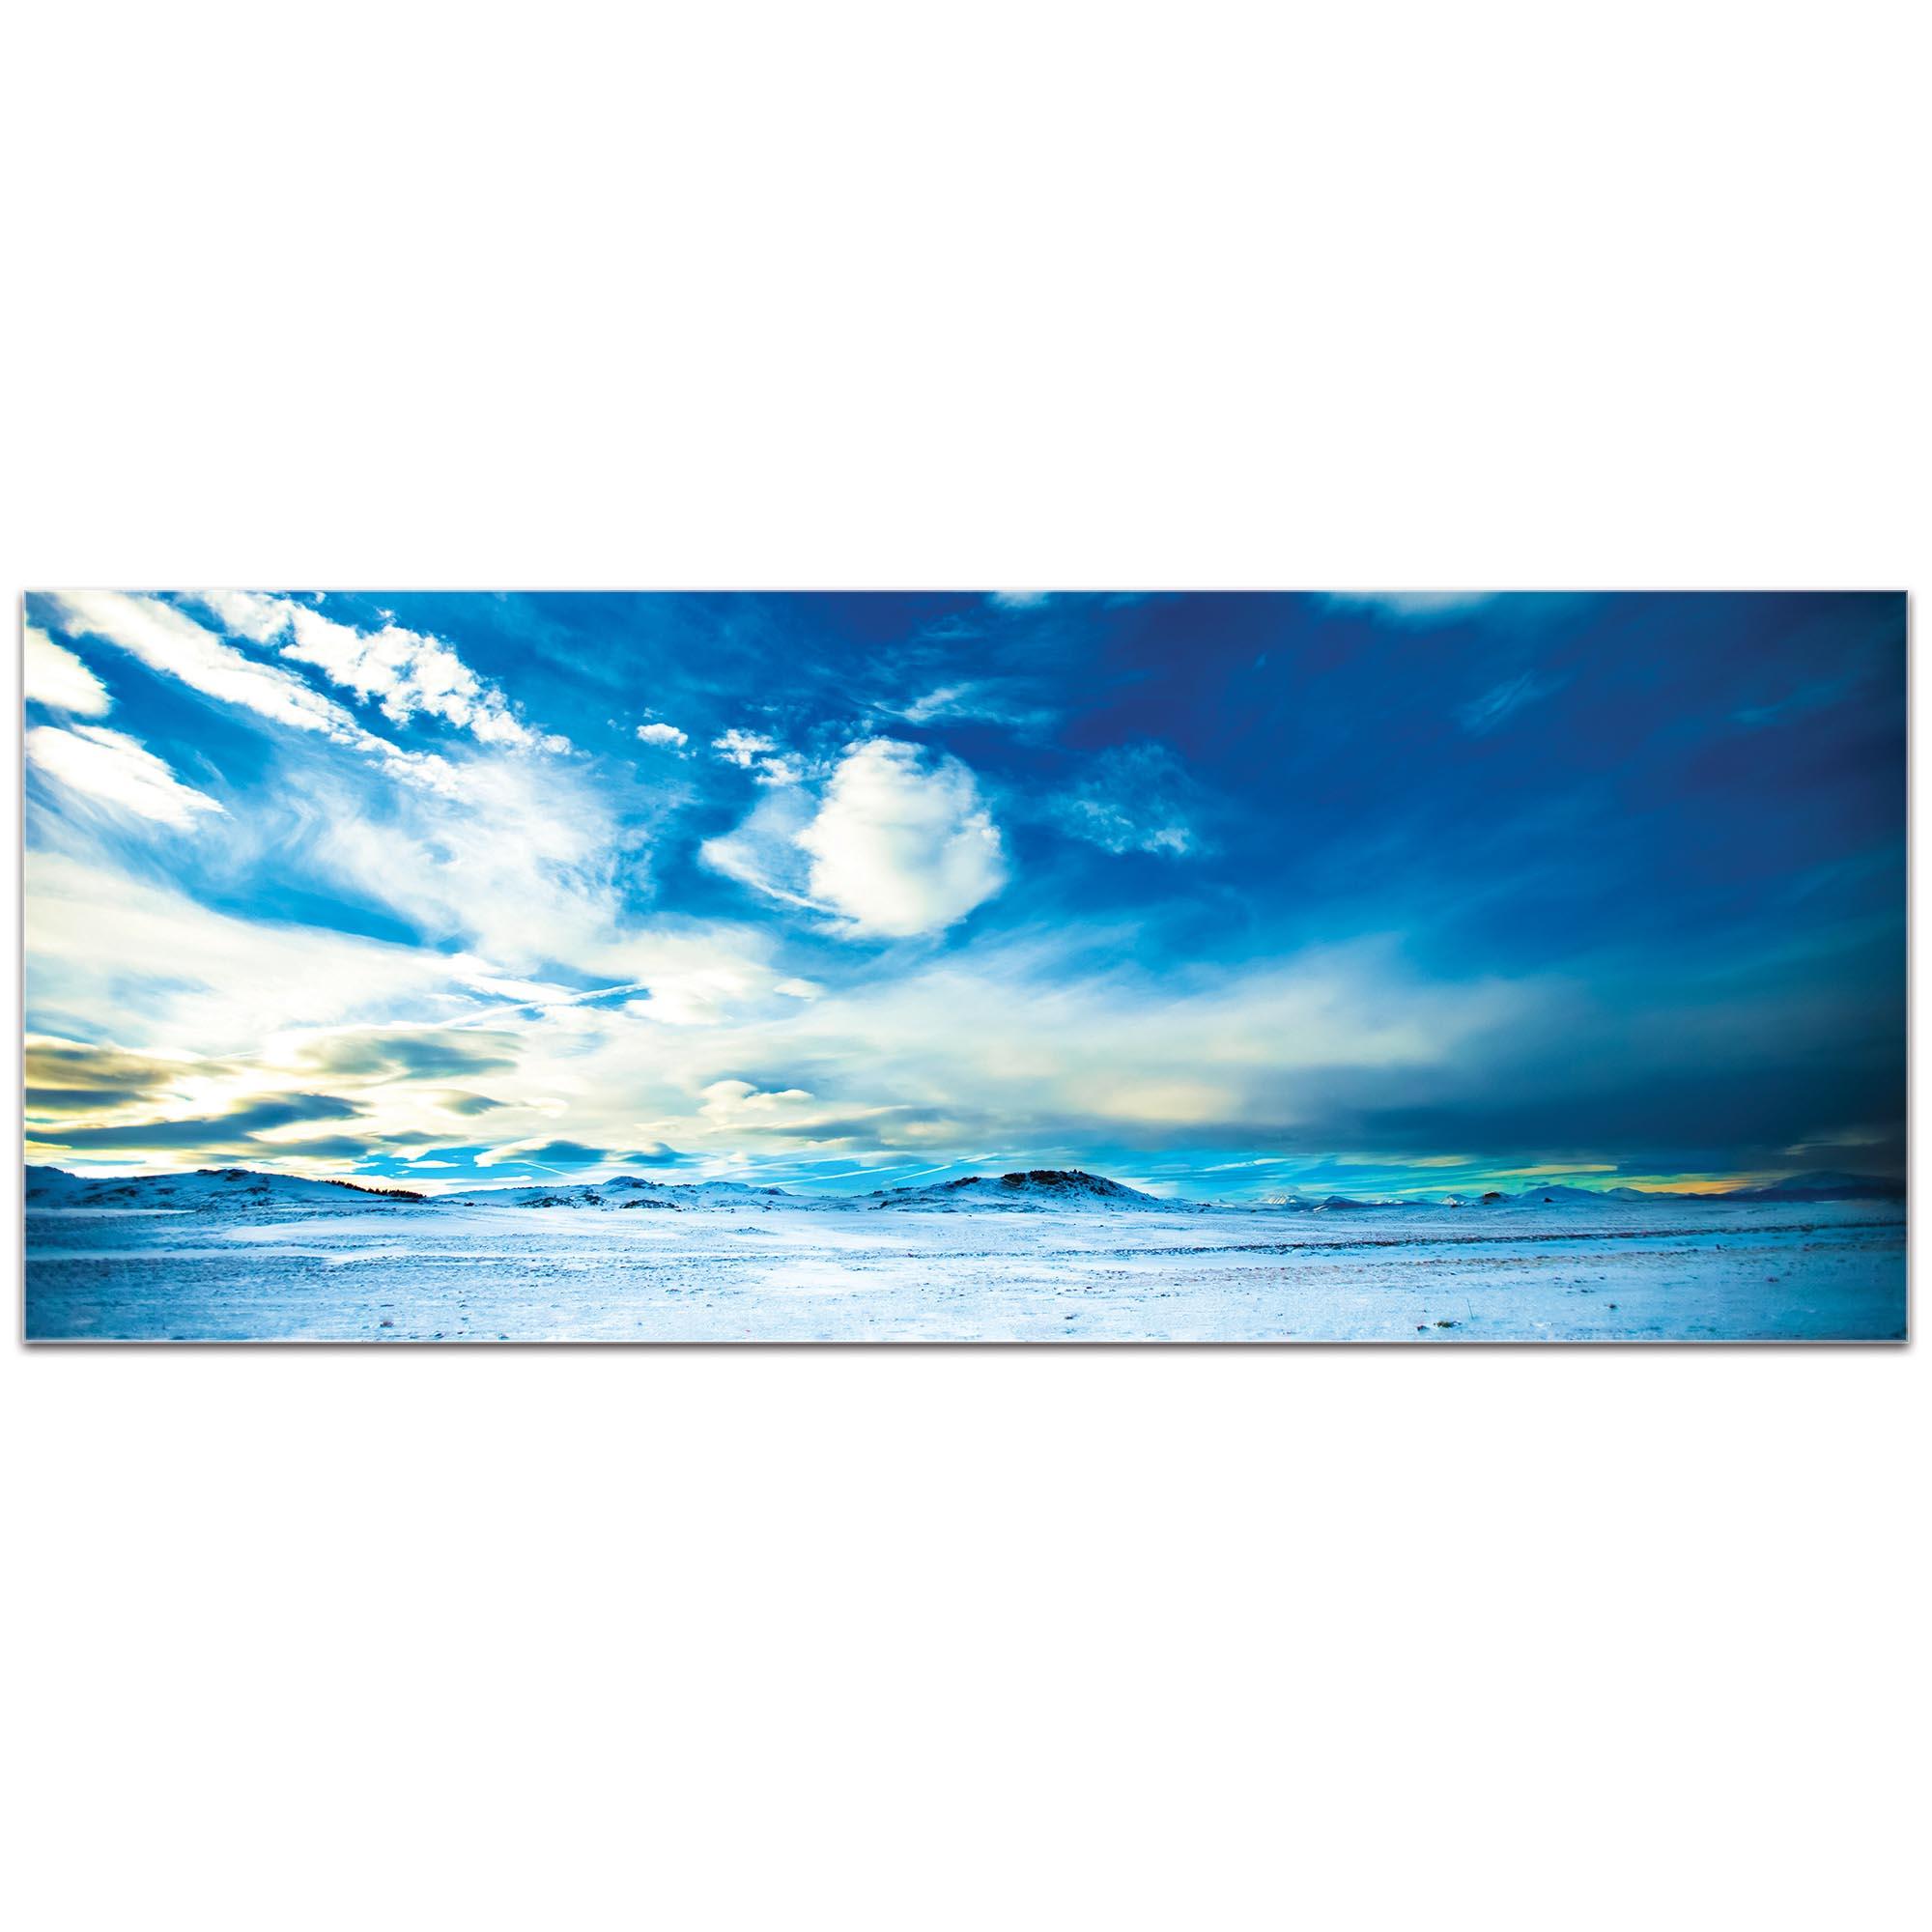 Landscape Photography 'Brisk Skyline' - Winter Scene Art on Metal or Plexiglass - Image 2